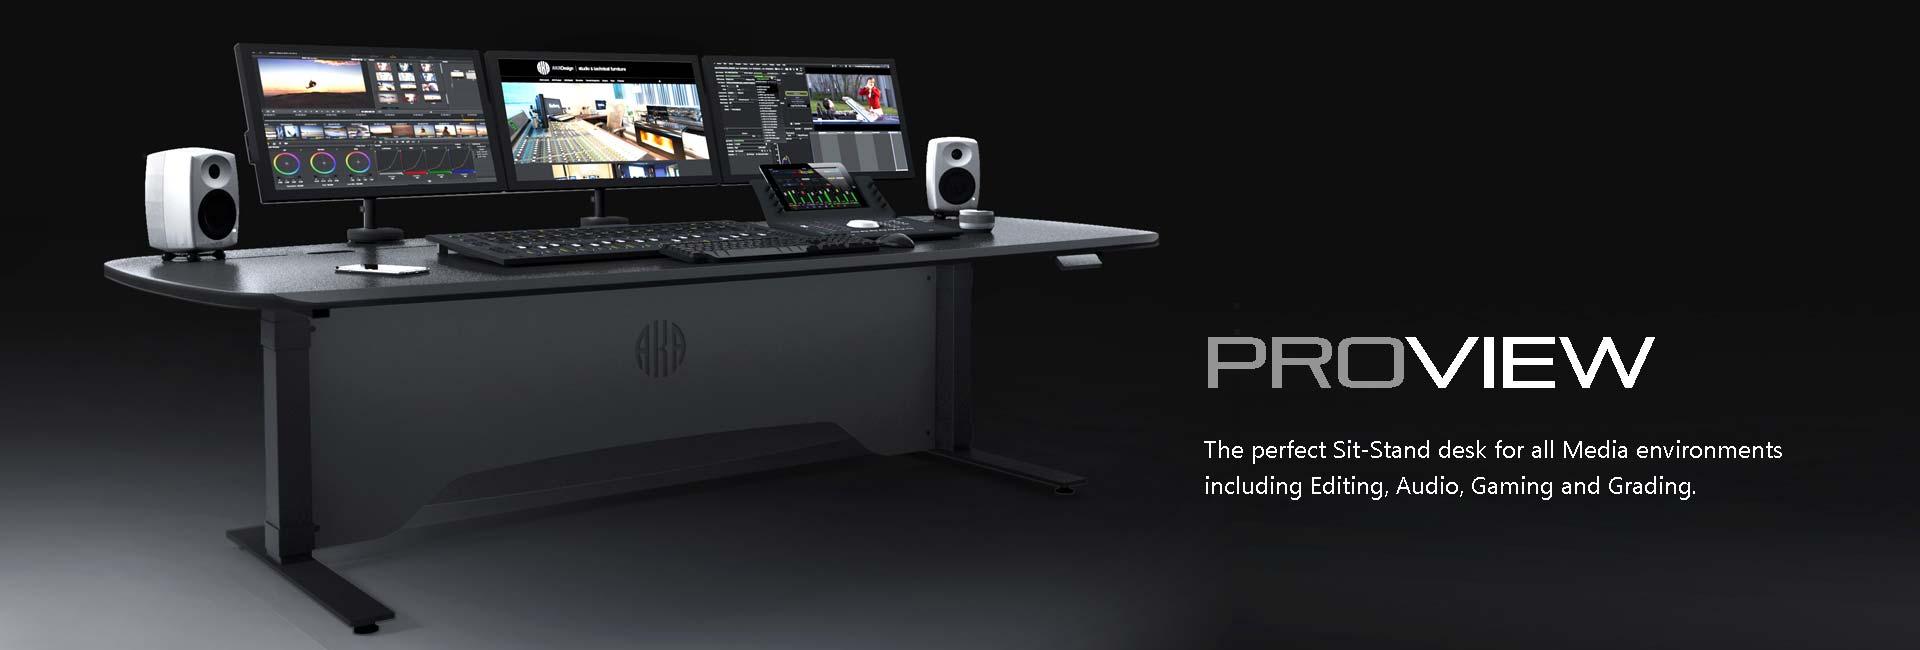 Picture of: Aka Design Design Manufacture Of Edit Desks Grading Desks Audio Desks And Broadcast Consoles For The Media Industries